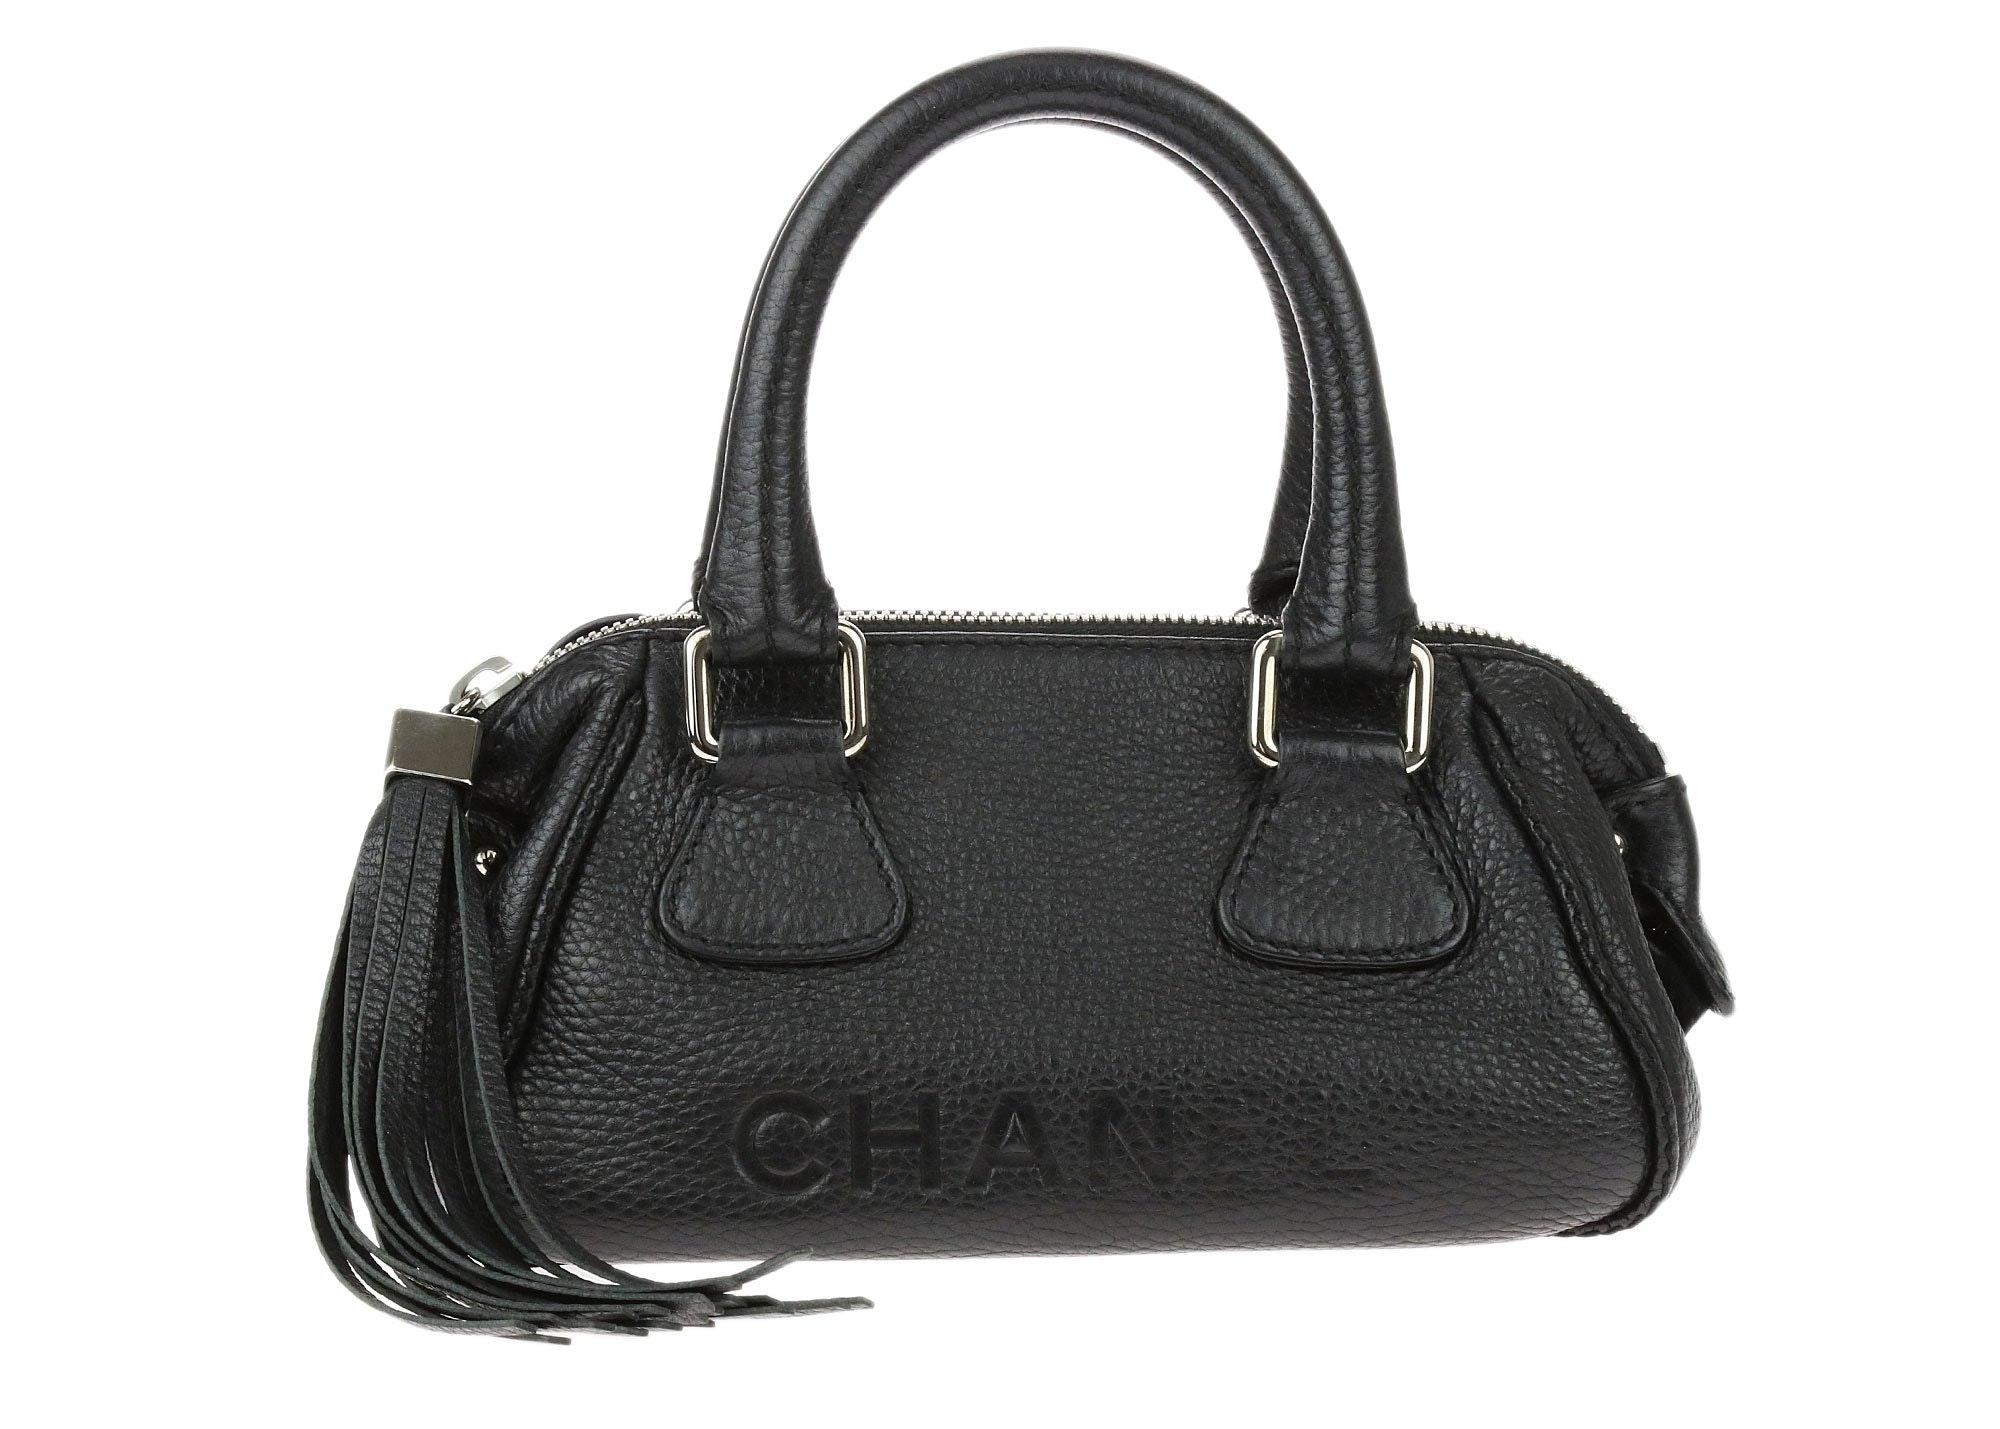 Chanel Lax Tessel Bowler Black